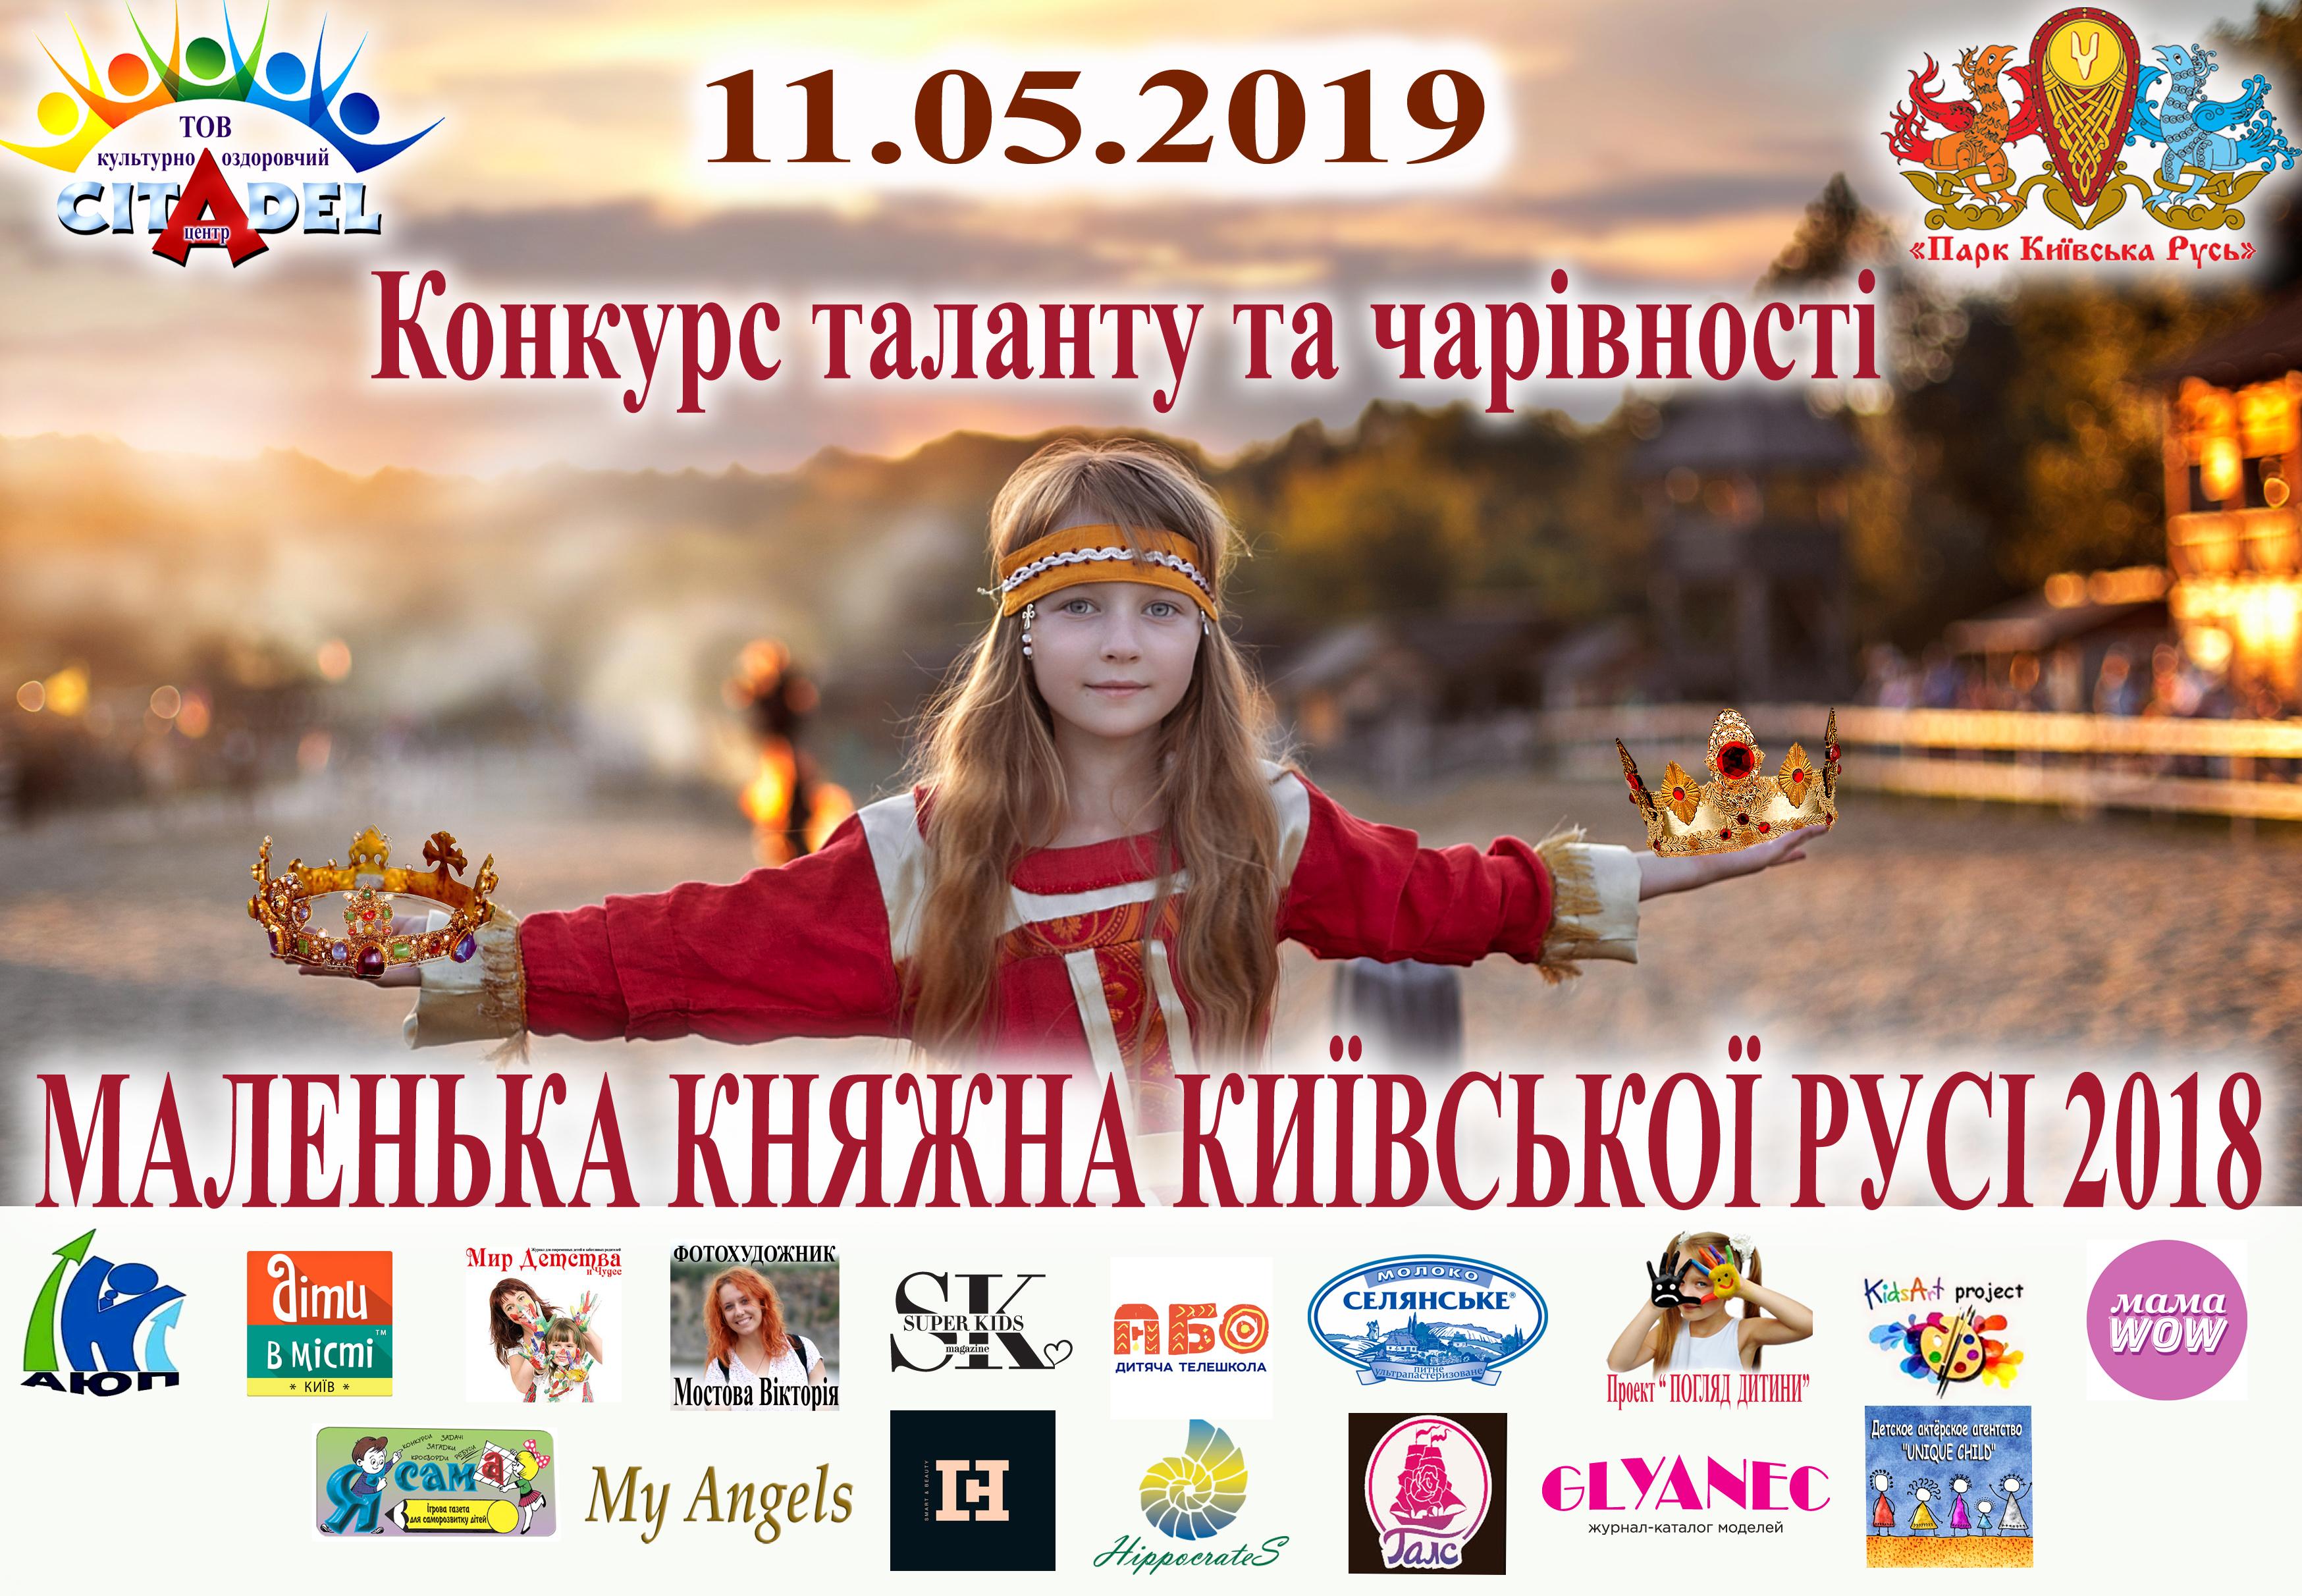 11.05.2019 Маленька Княжна Київської Русі 2019